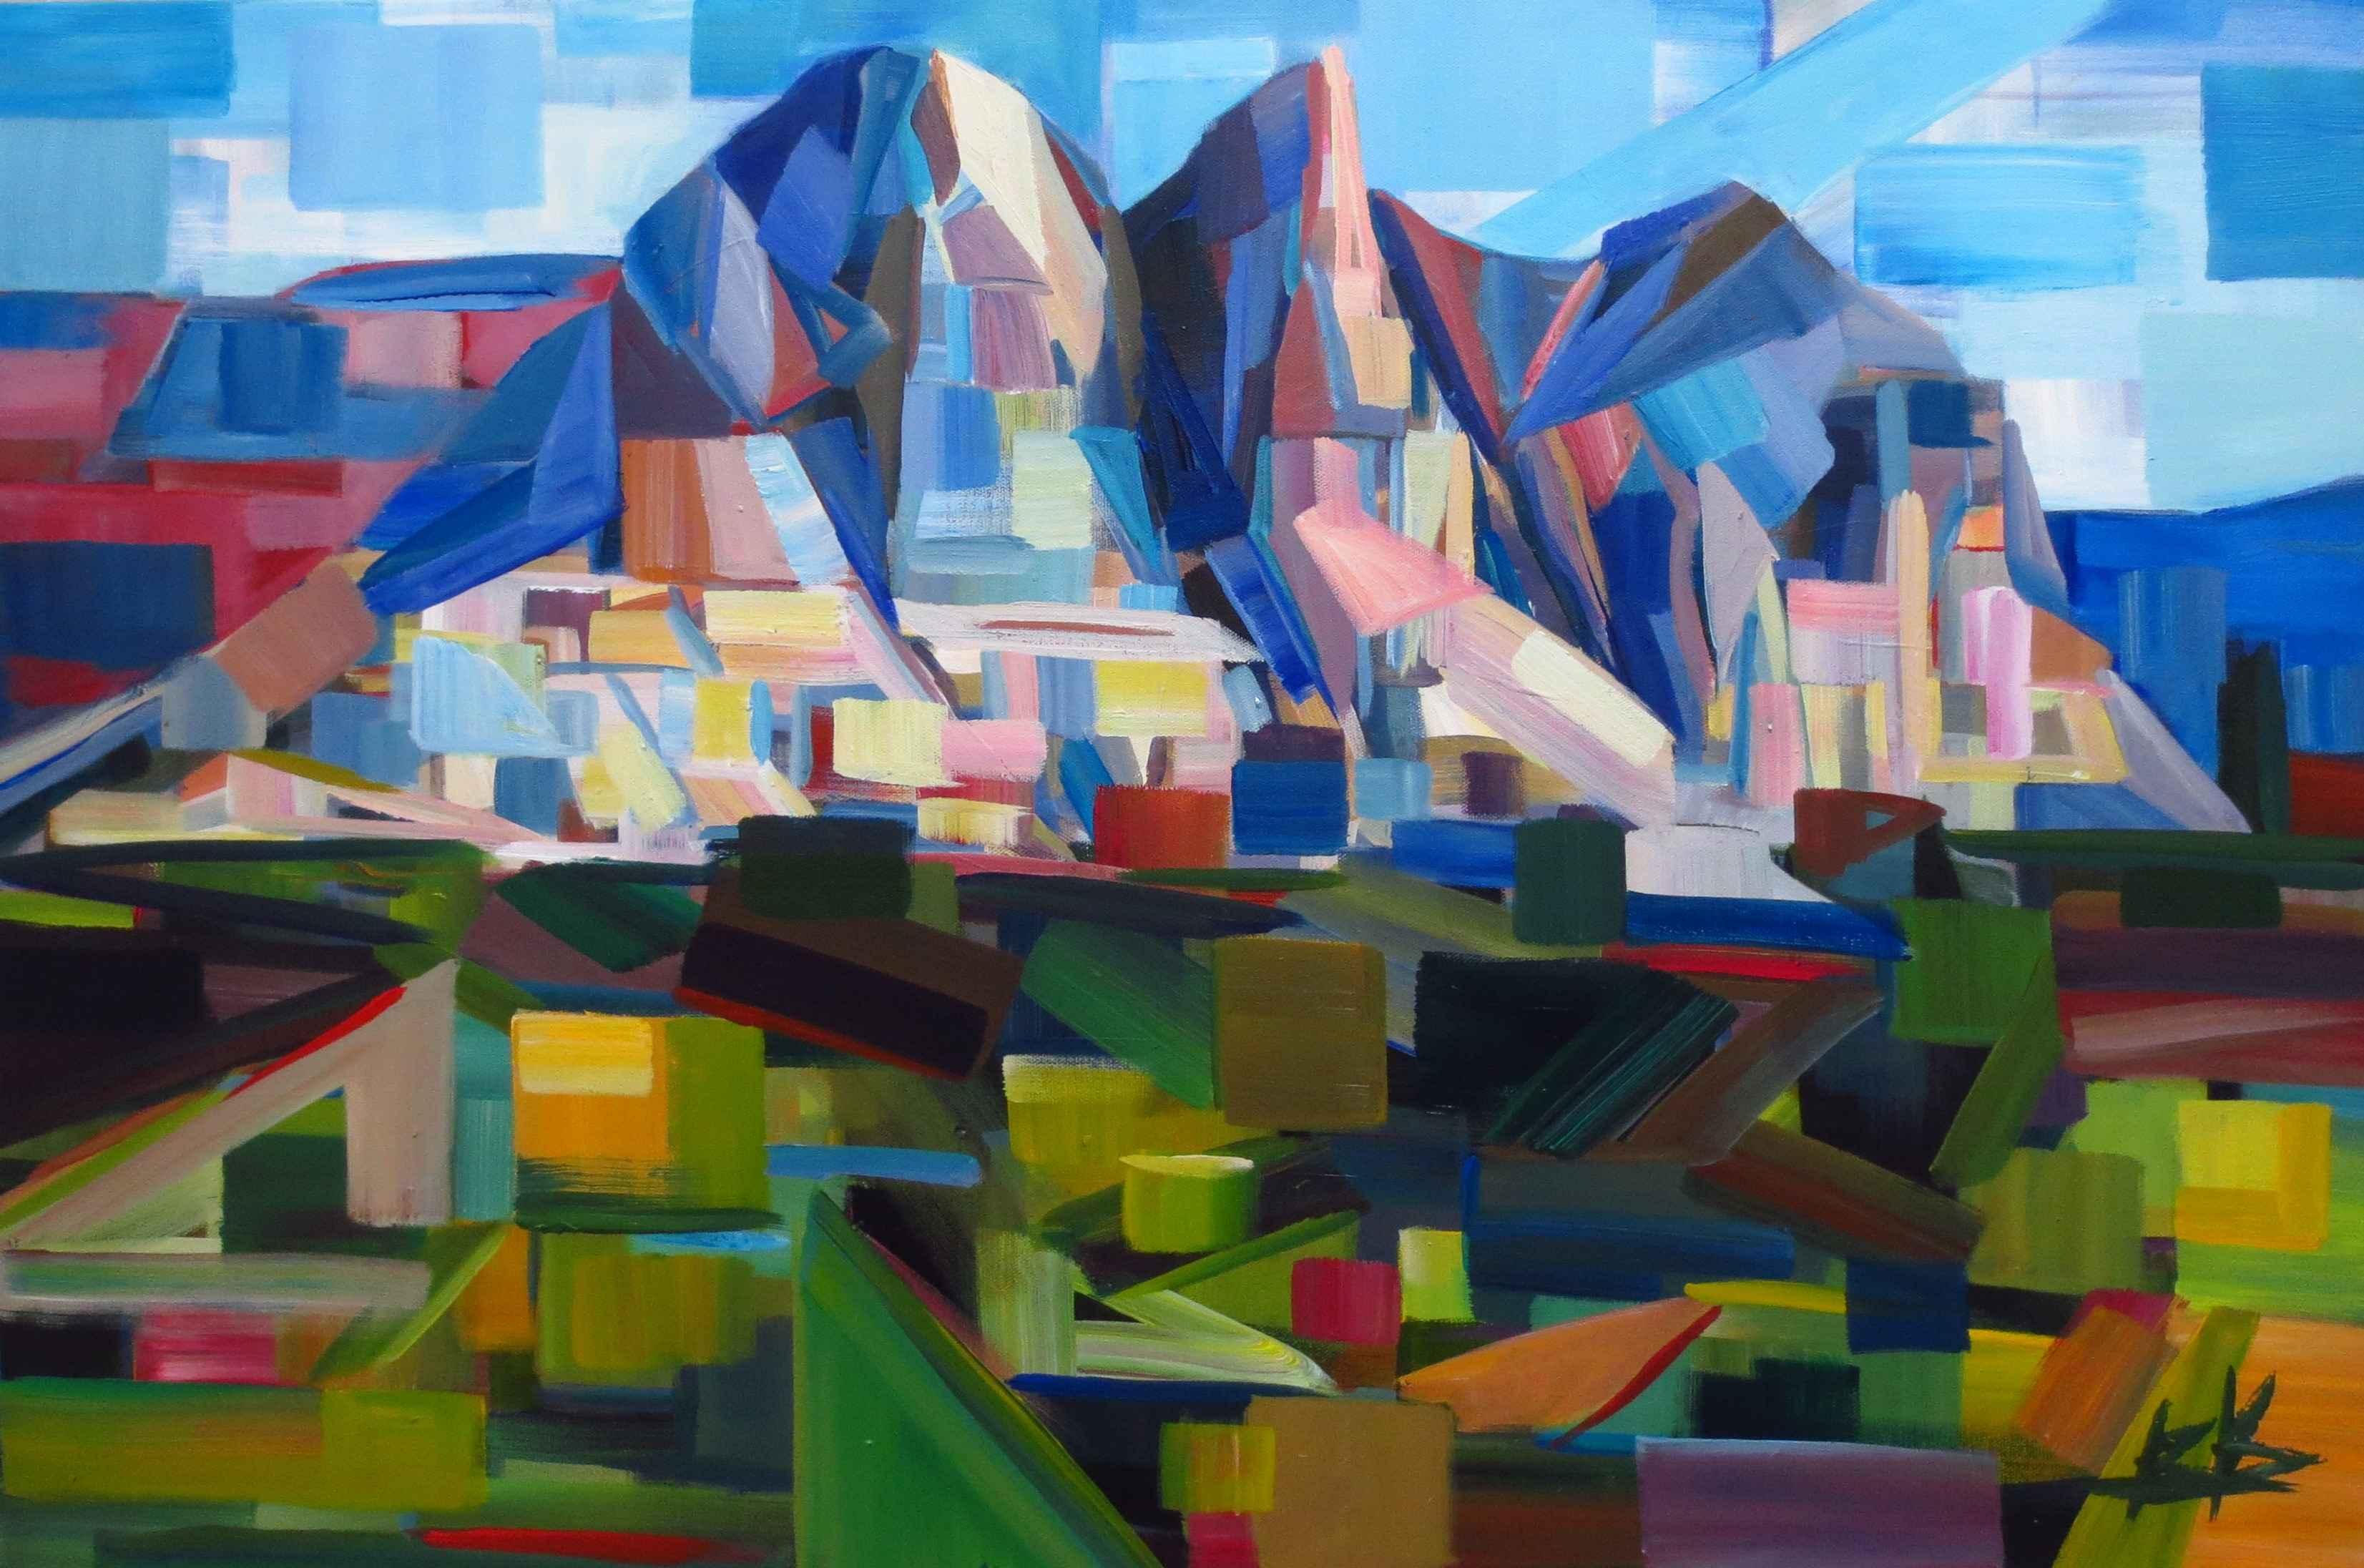 Morning Mountains by  Brooke Borcherding - Masterpiece Online